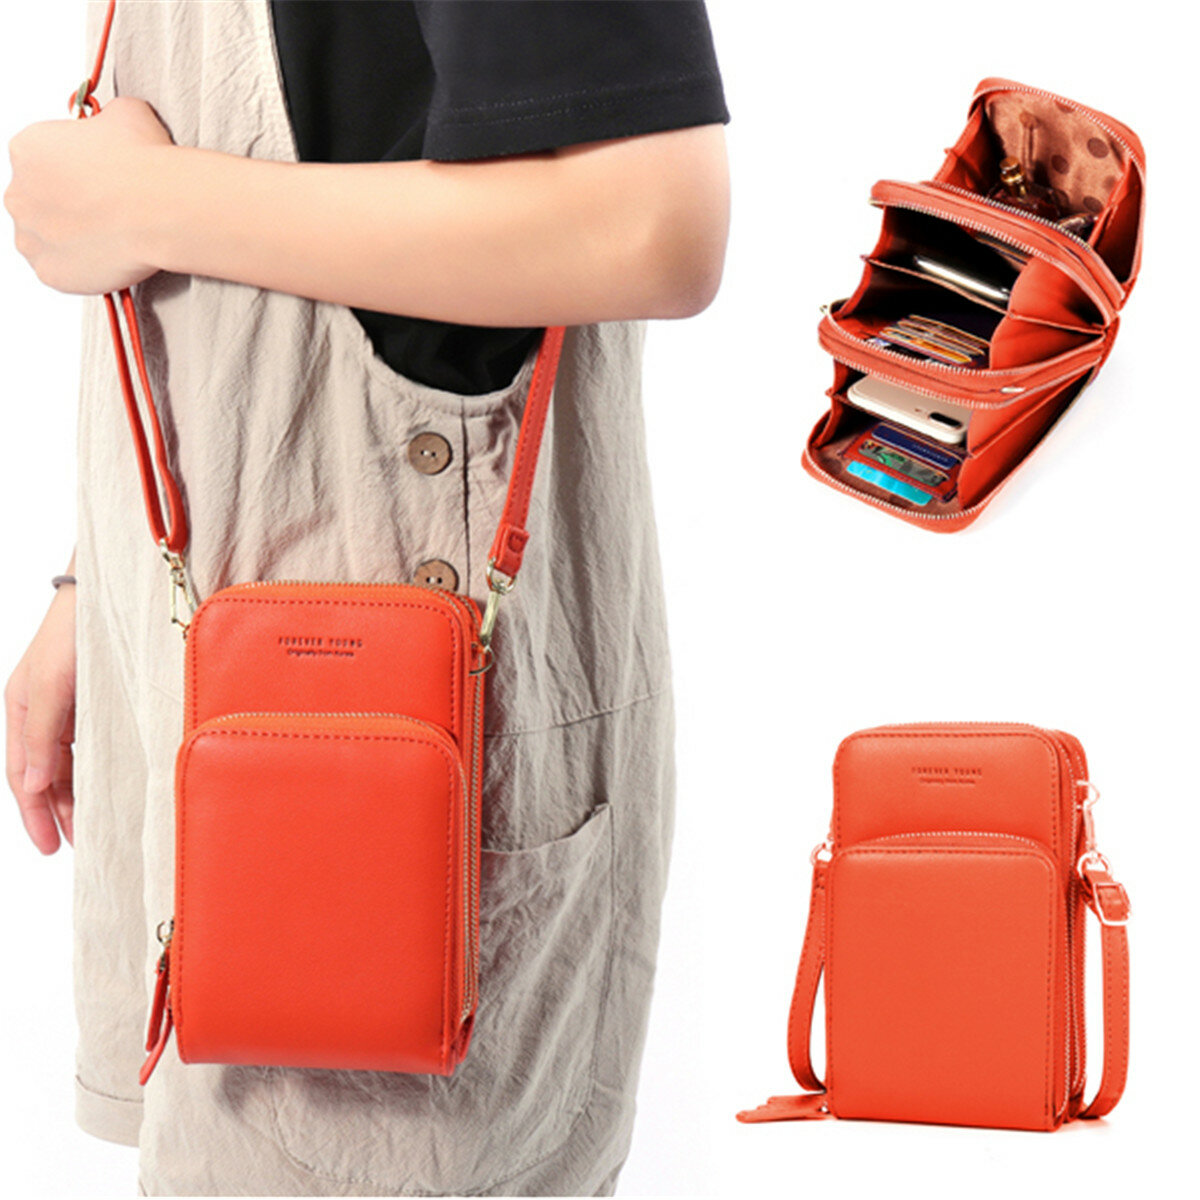 Women PU leather Clutch Bag Card Bag Phone Bag Crossbody Bag